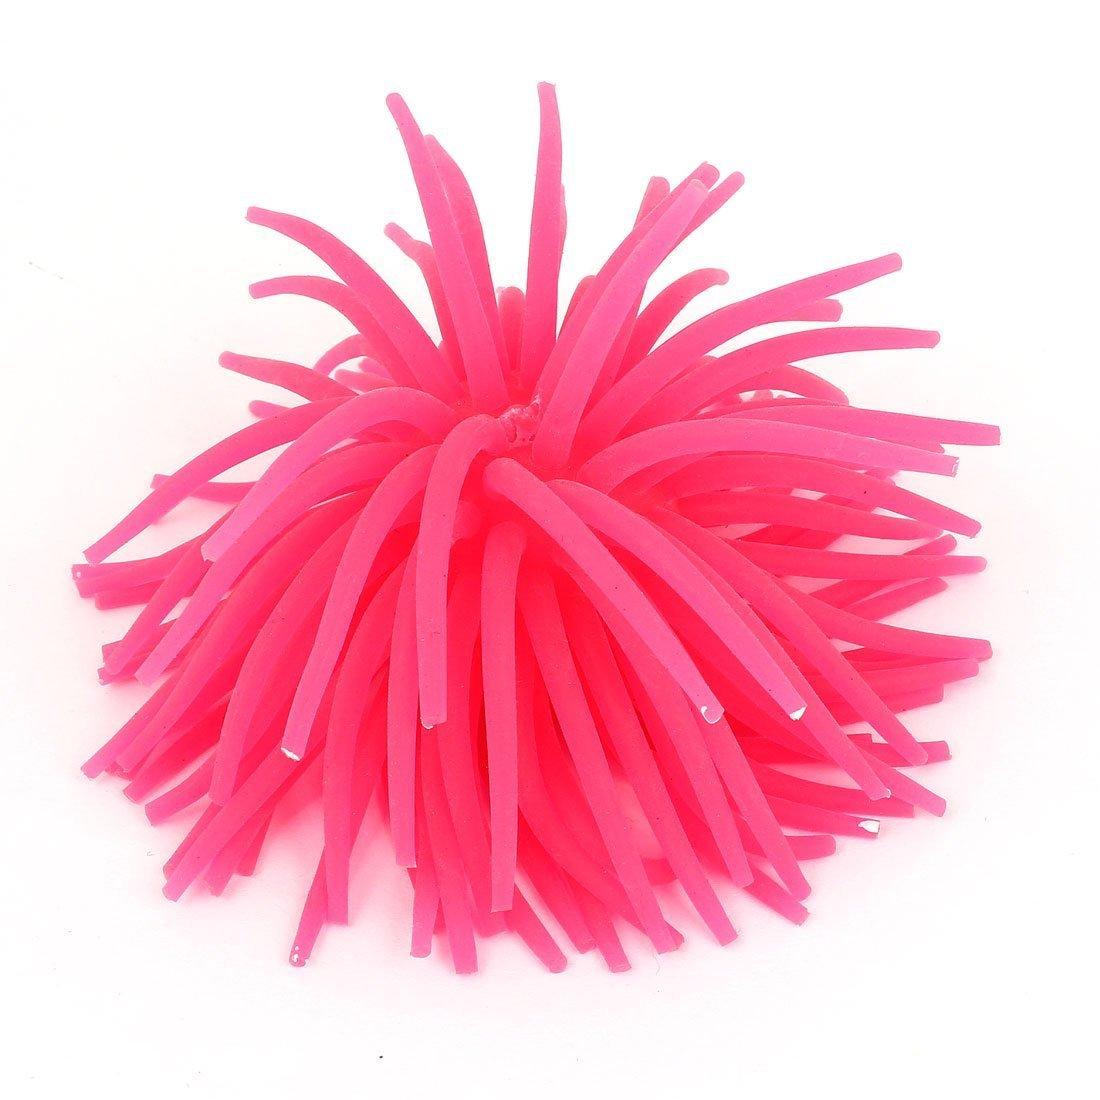 1Pc Soft Silicone Aquarium Fish Tank Manmade Coral Decor 3 Inch High Pink